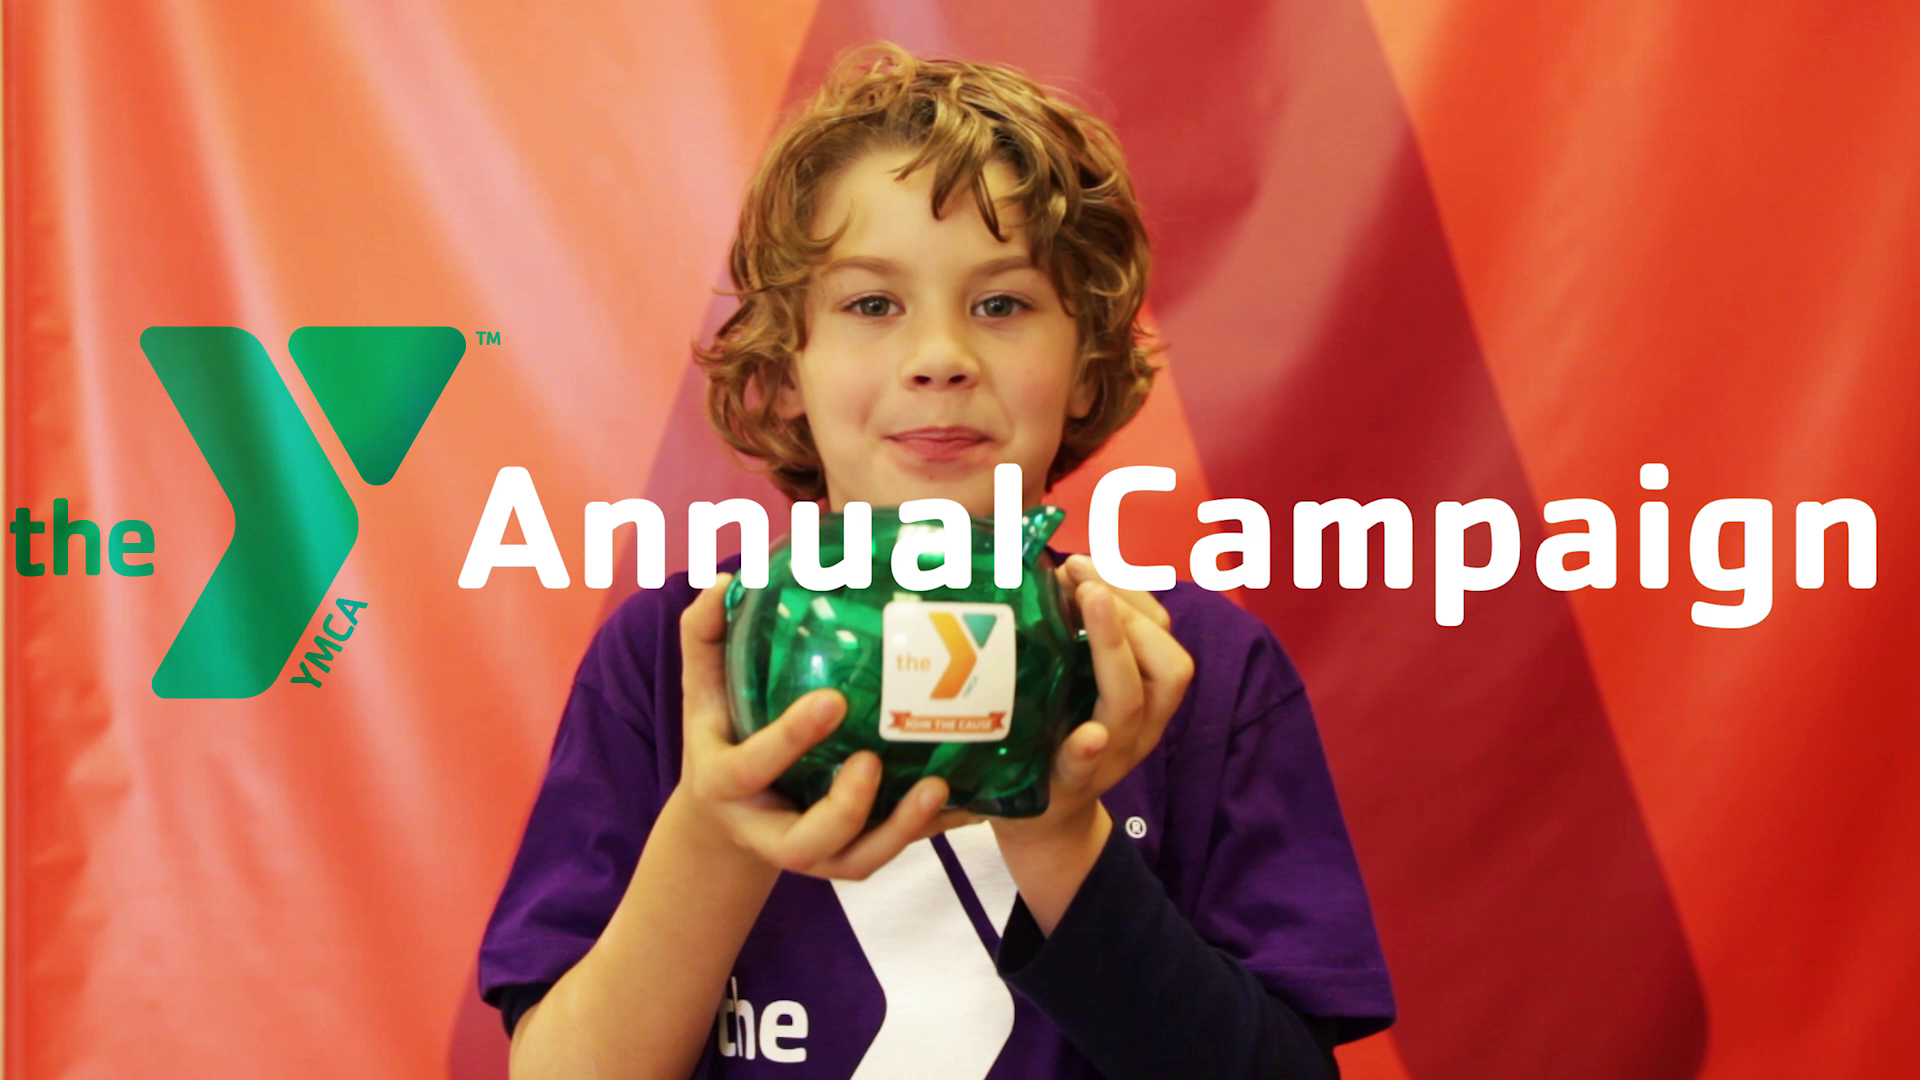 YMCA Annual Campaign 2014